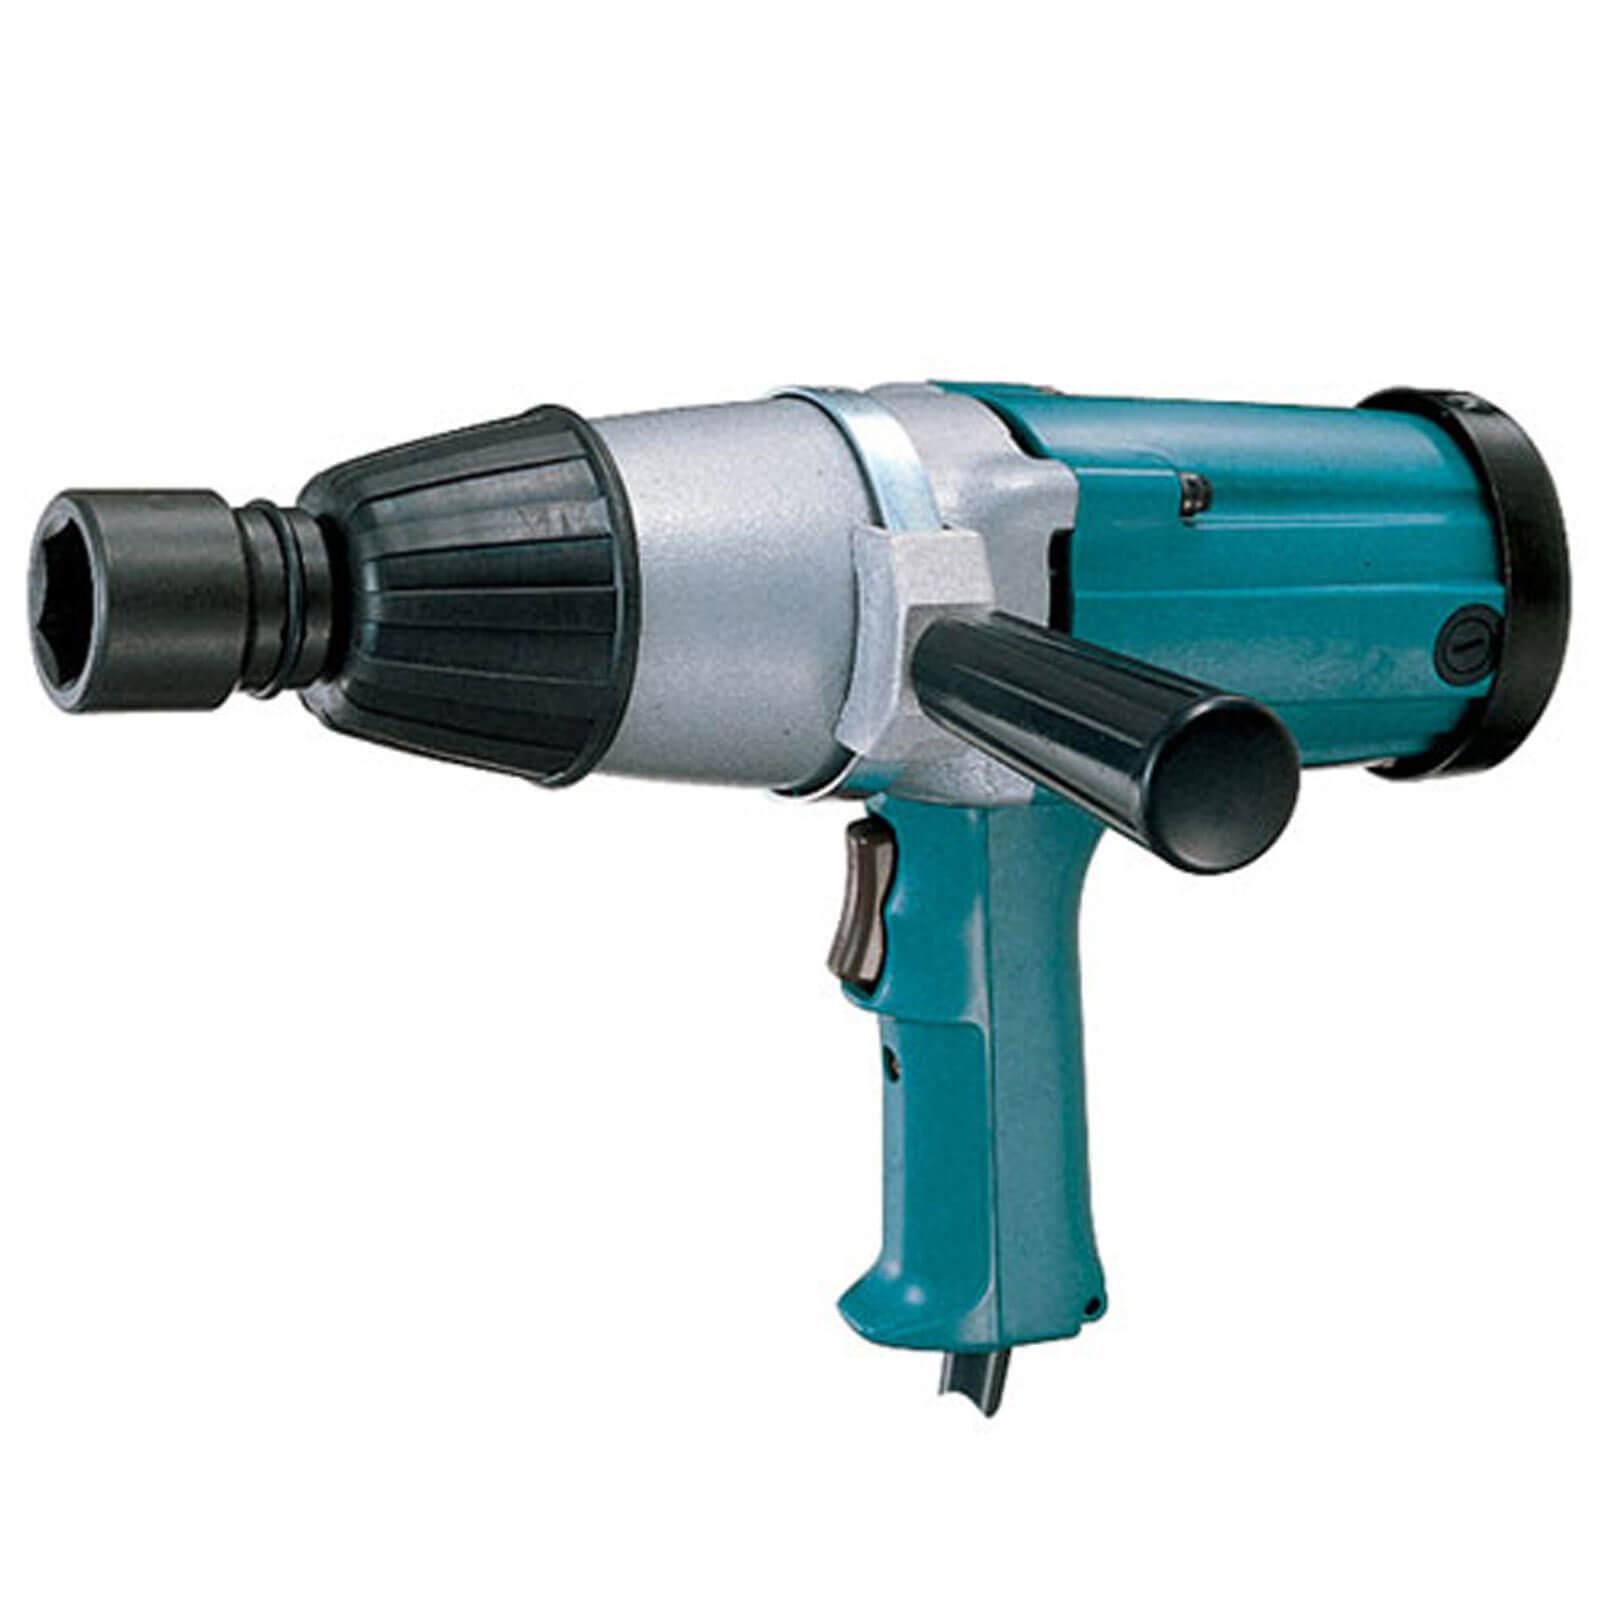 Makita 6906 Impact Wrench 3/4